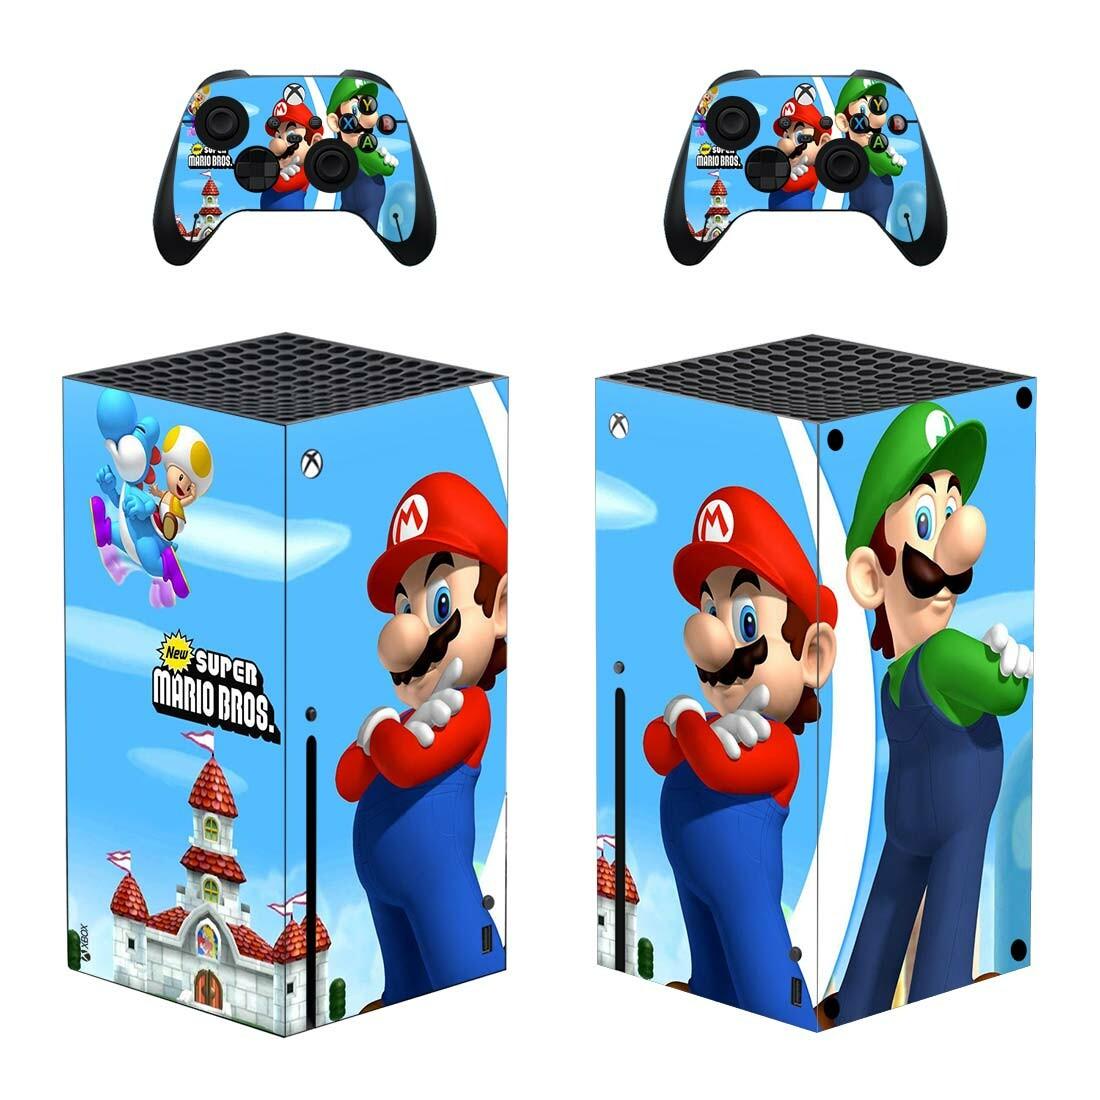 Super Mario Bros Xbox Series X Skin Sticker Decal